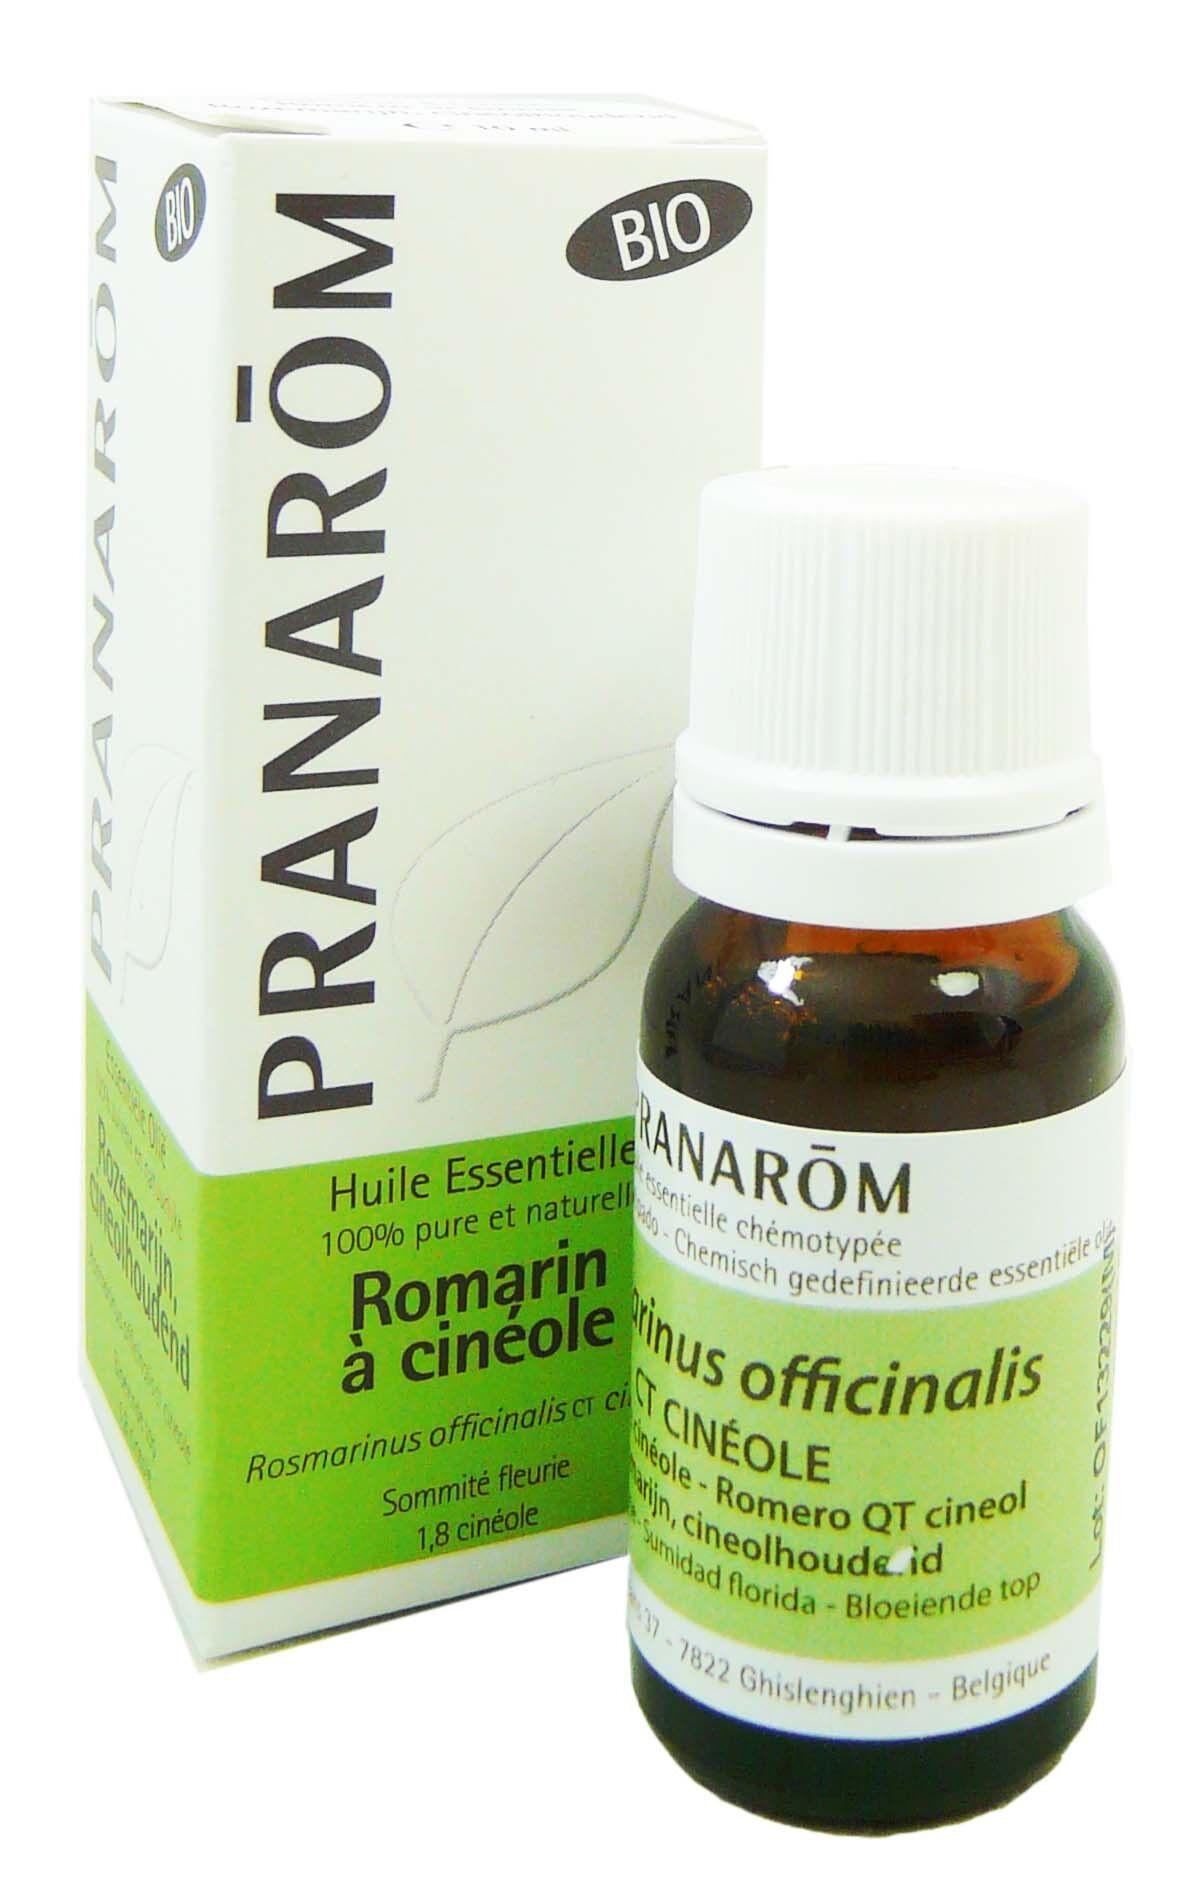 Pranarom huile essentielle bio romarin a cineole 10ml